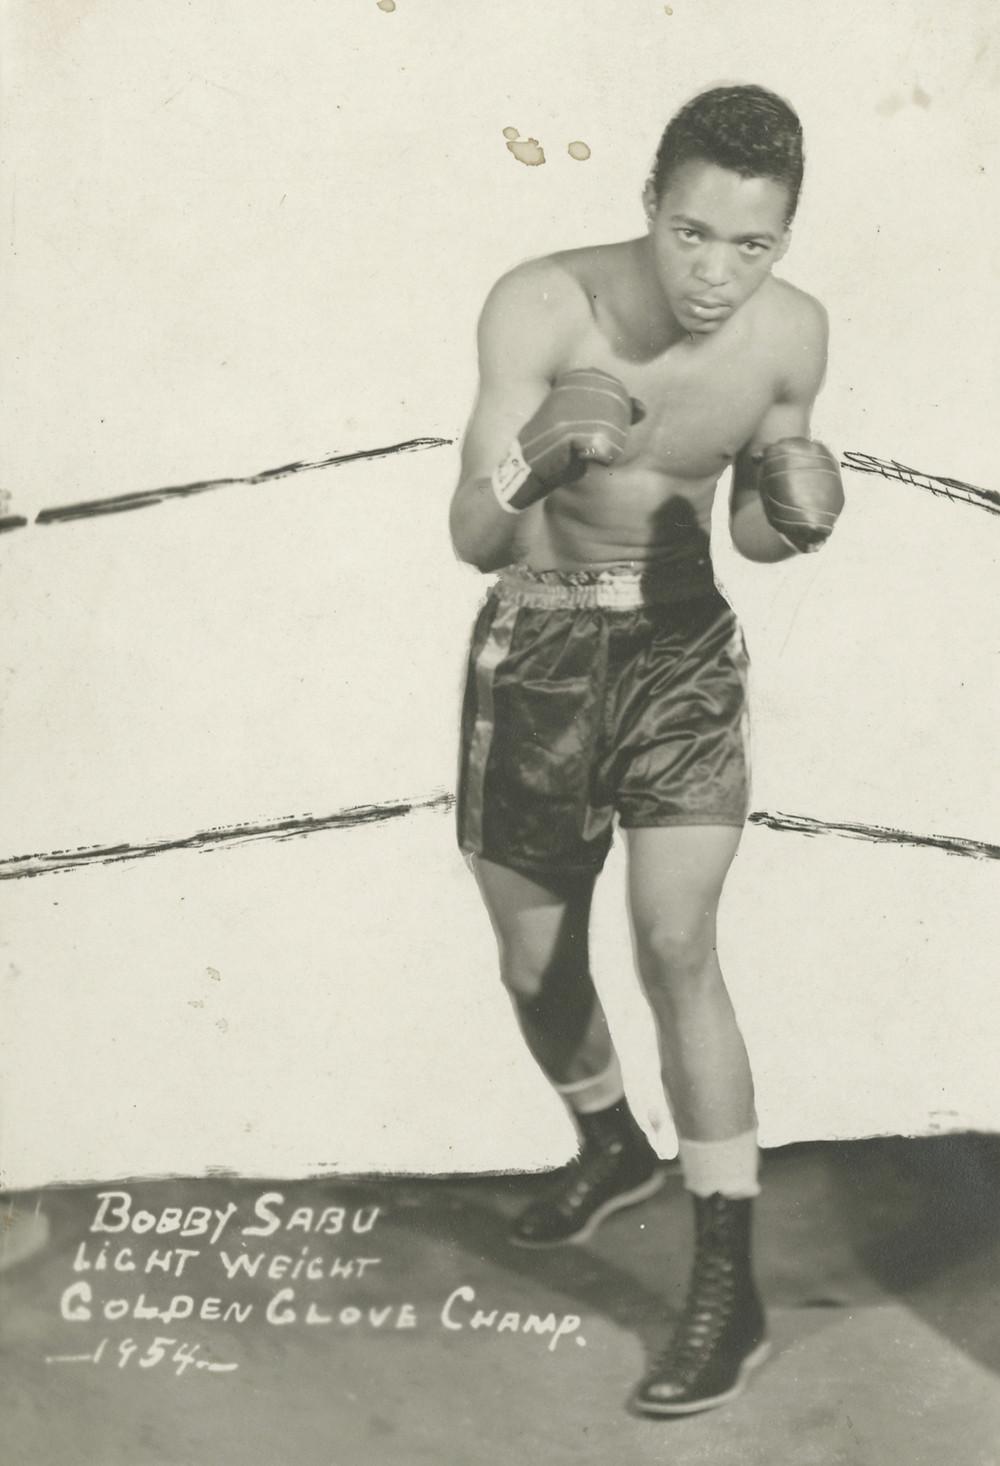 James Van Der Zee, Bobby Sabu, Lightweight Golden Gloves Champ, 1954